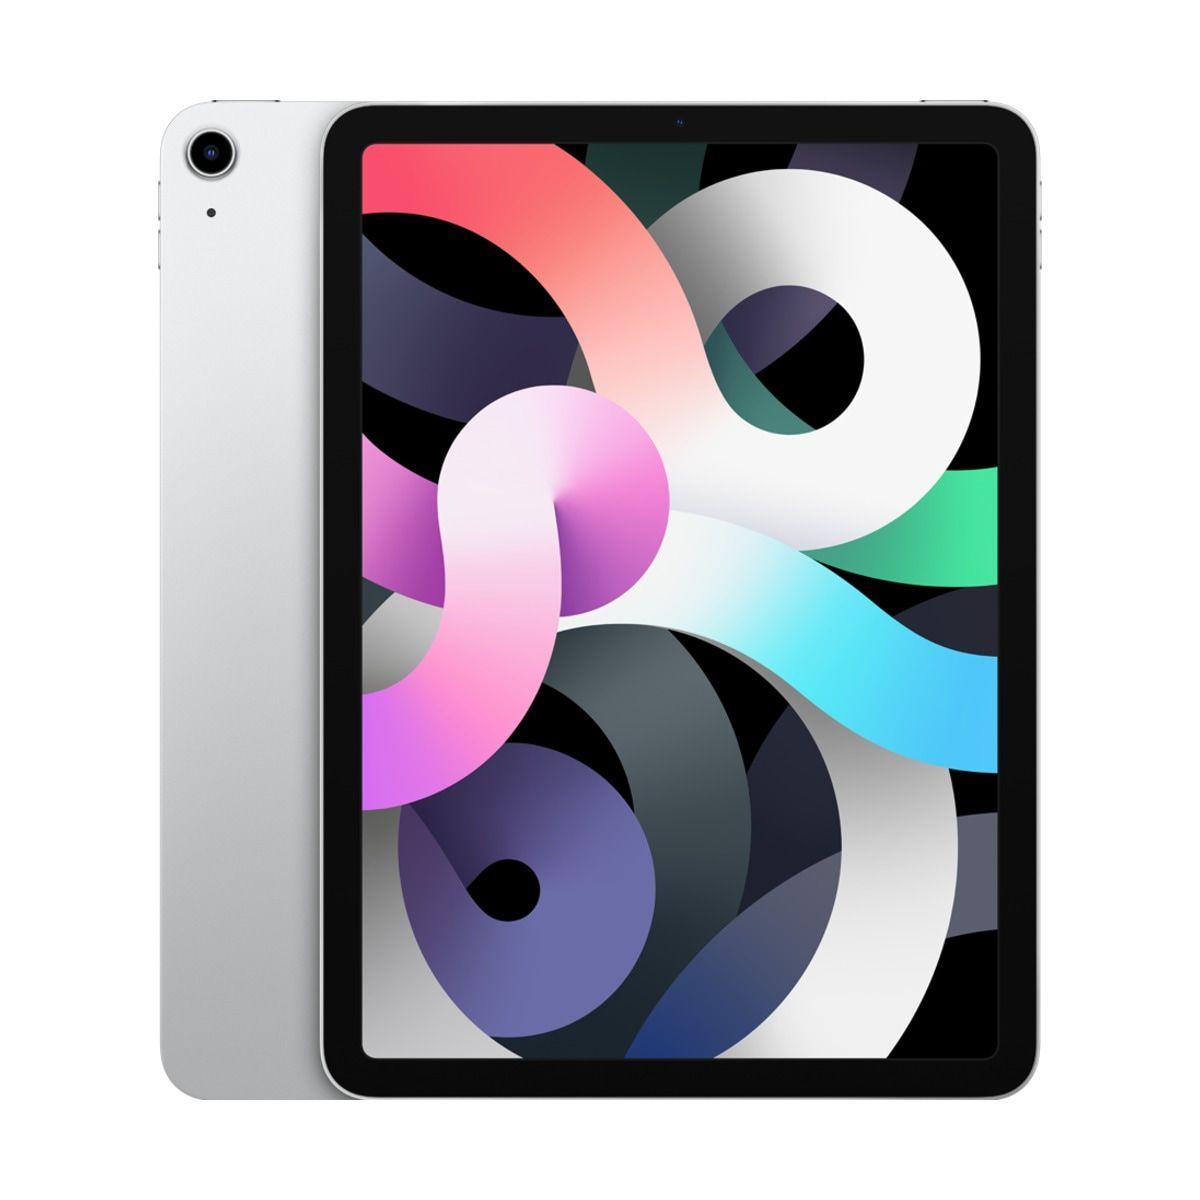 Apple iPad Air Wi-Fi 256GB - Silver / SK